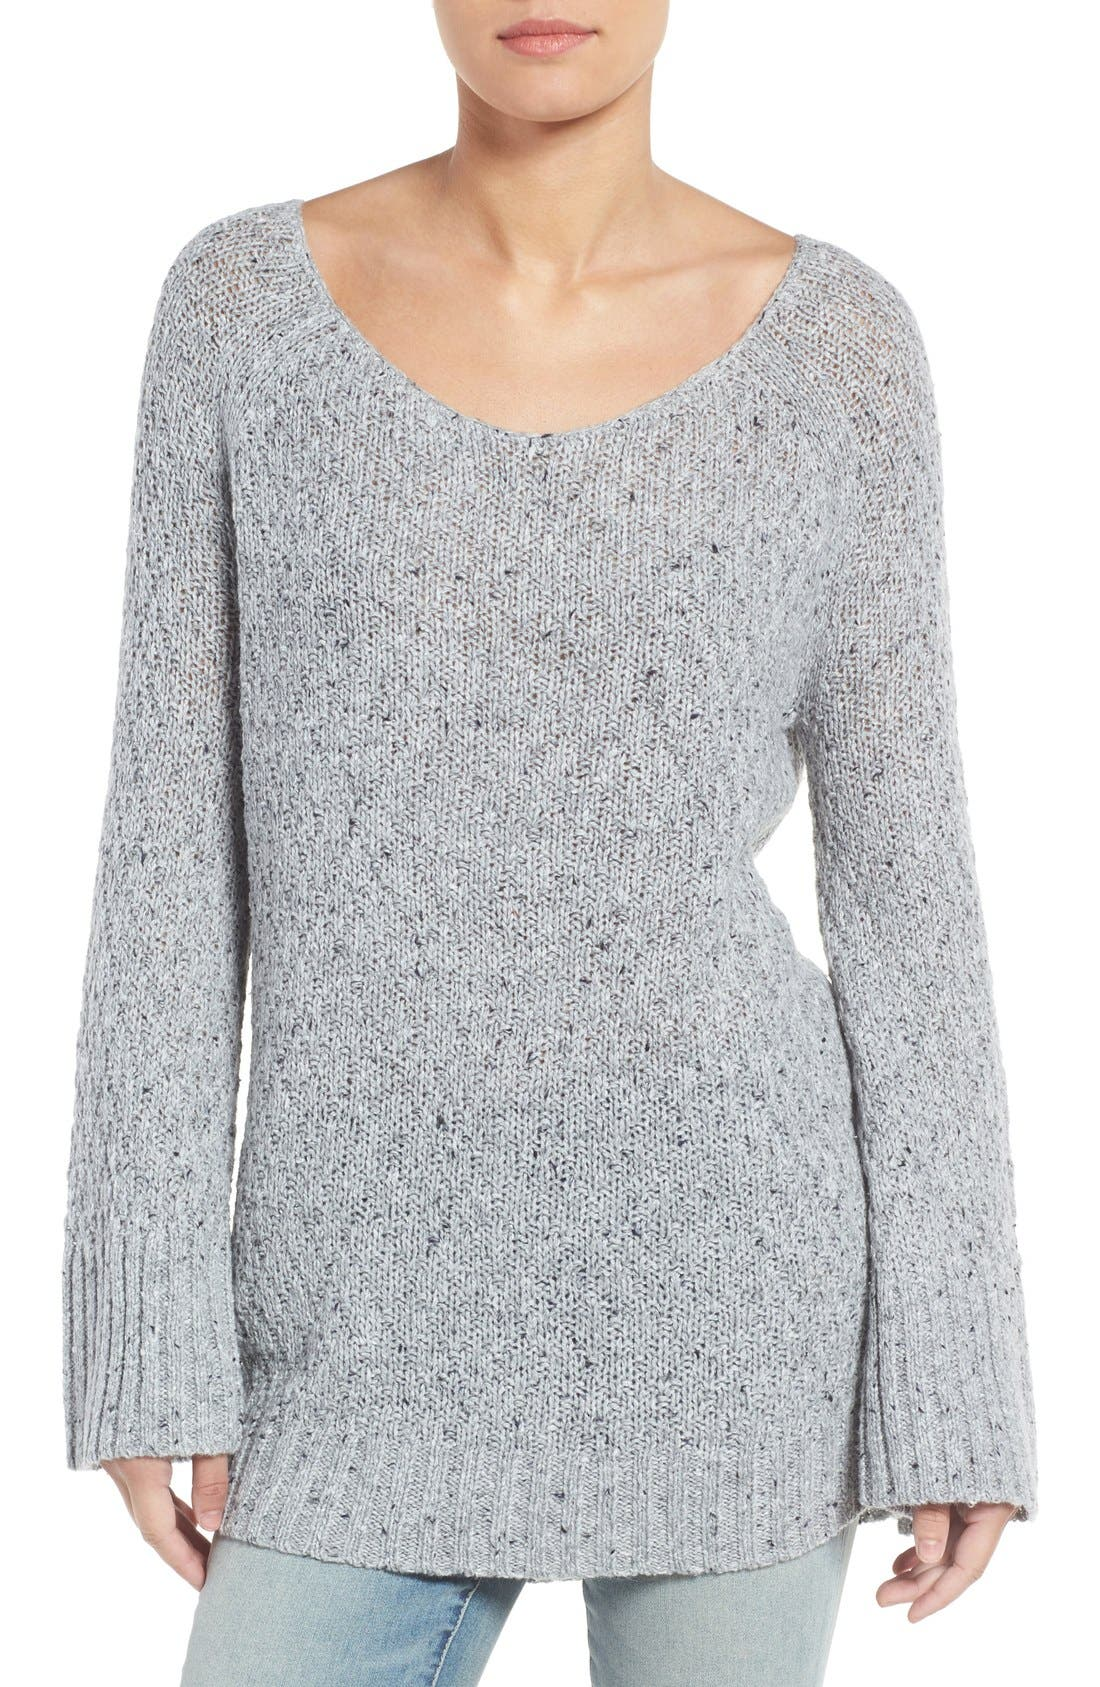 Main Image - Hinge Slouchy Tunic Sweater